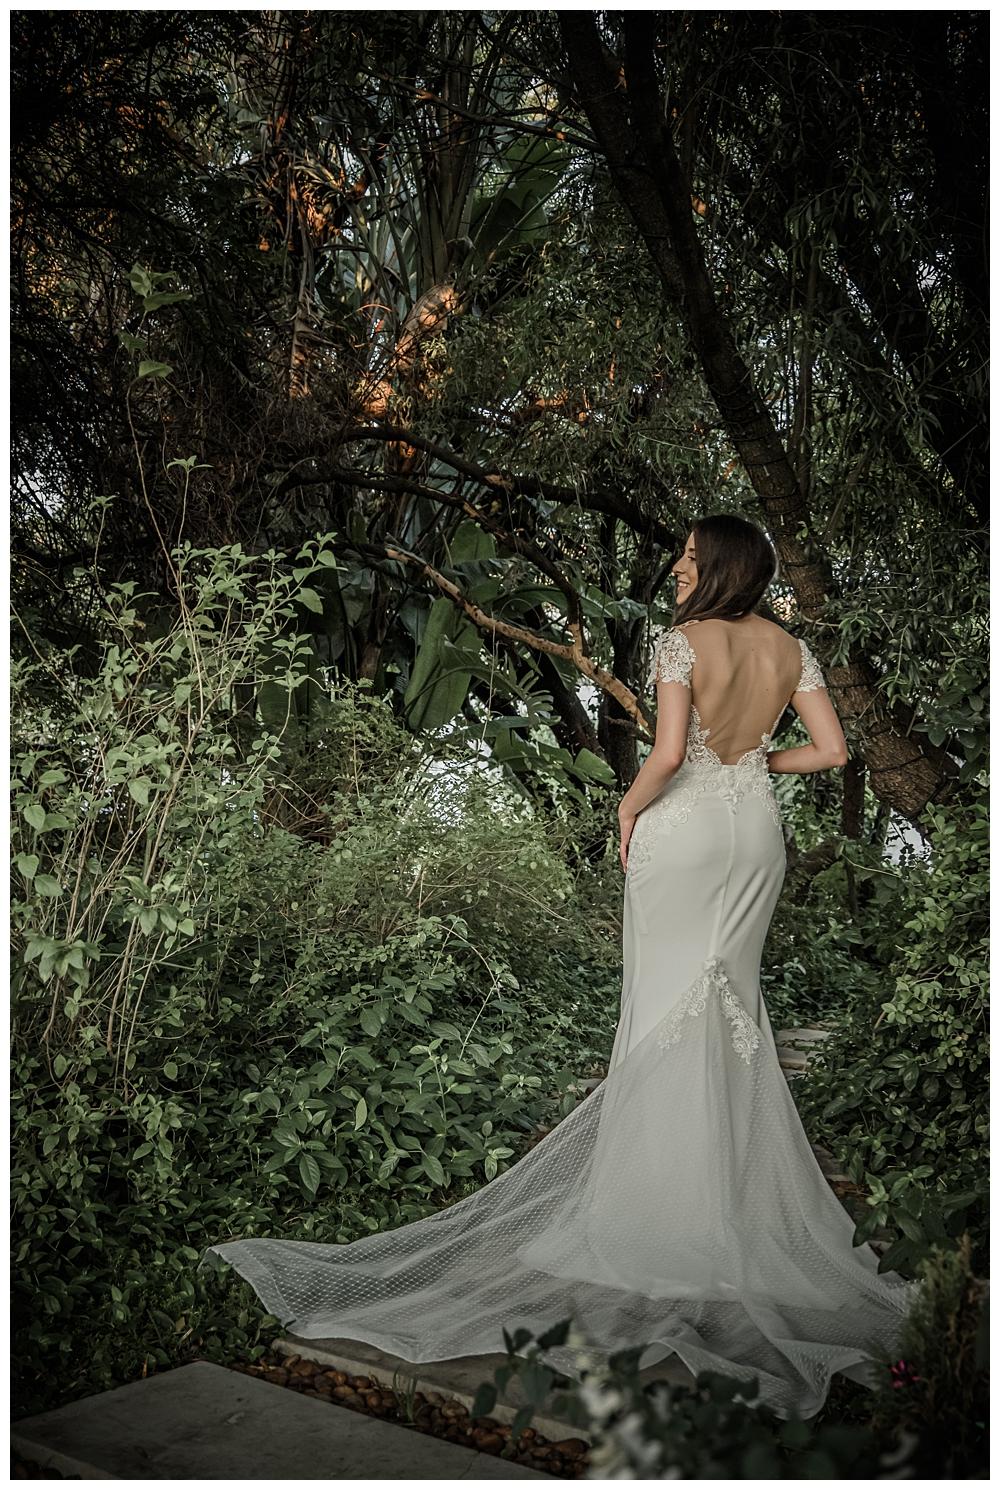 Best_Wedding_Photographer_AlexanderSmith_0235.jpg